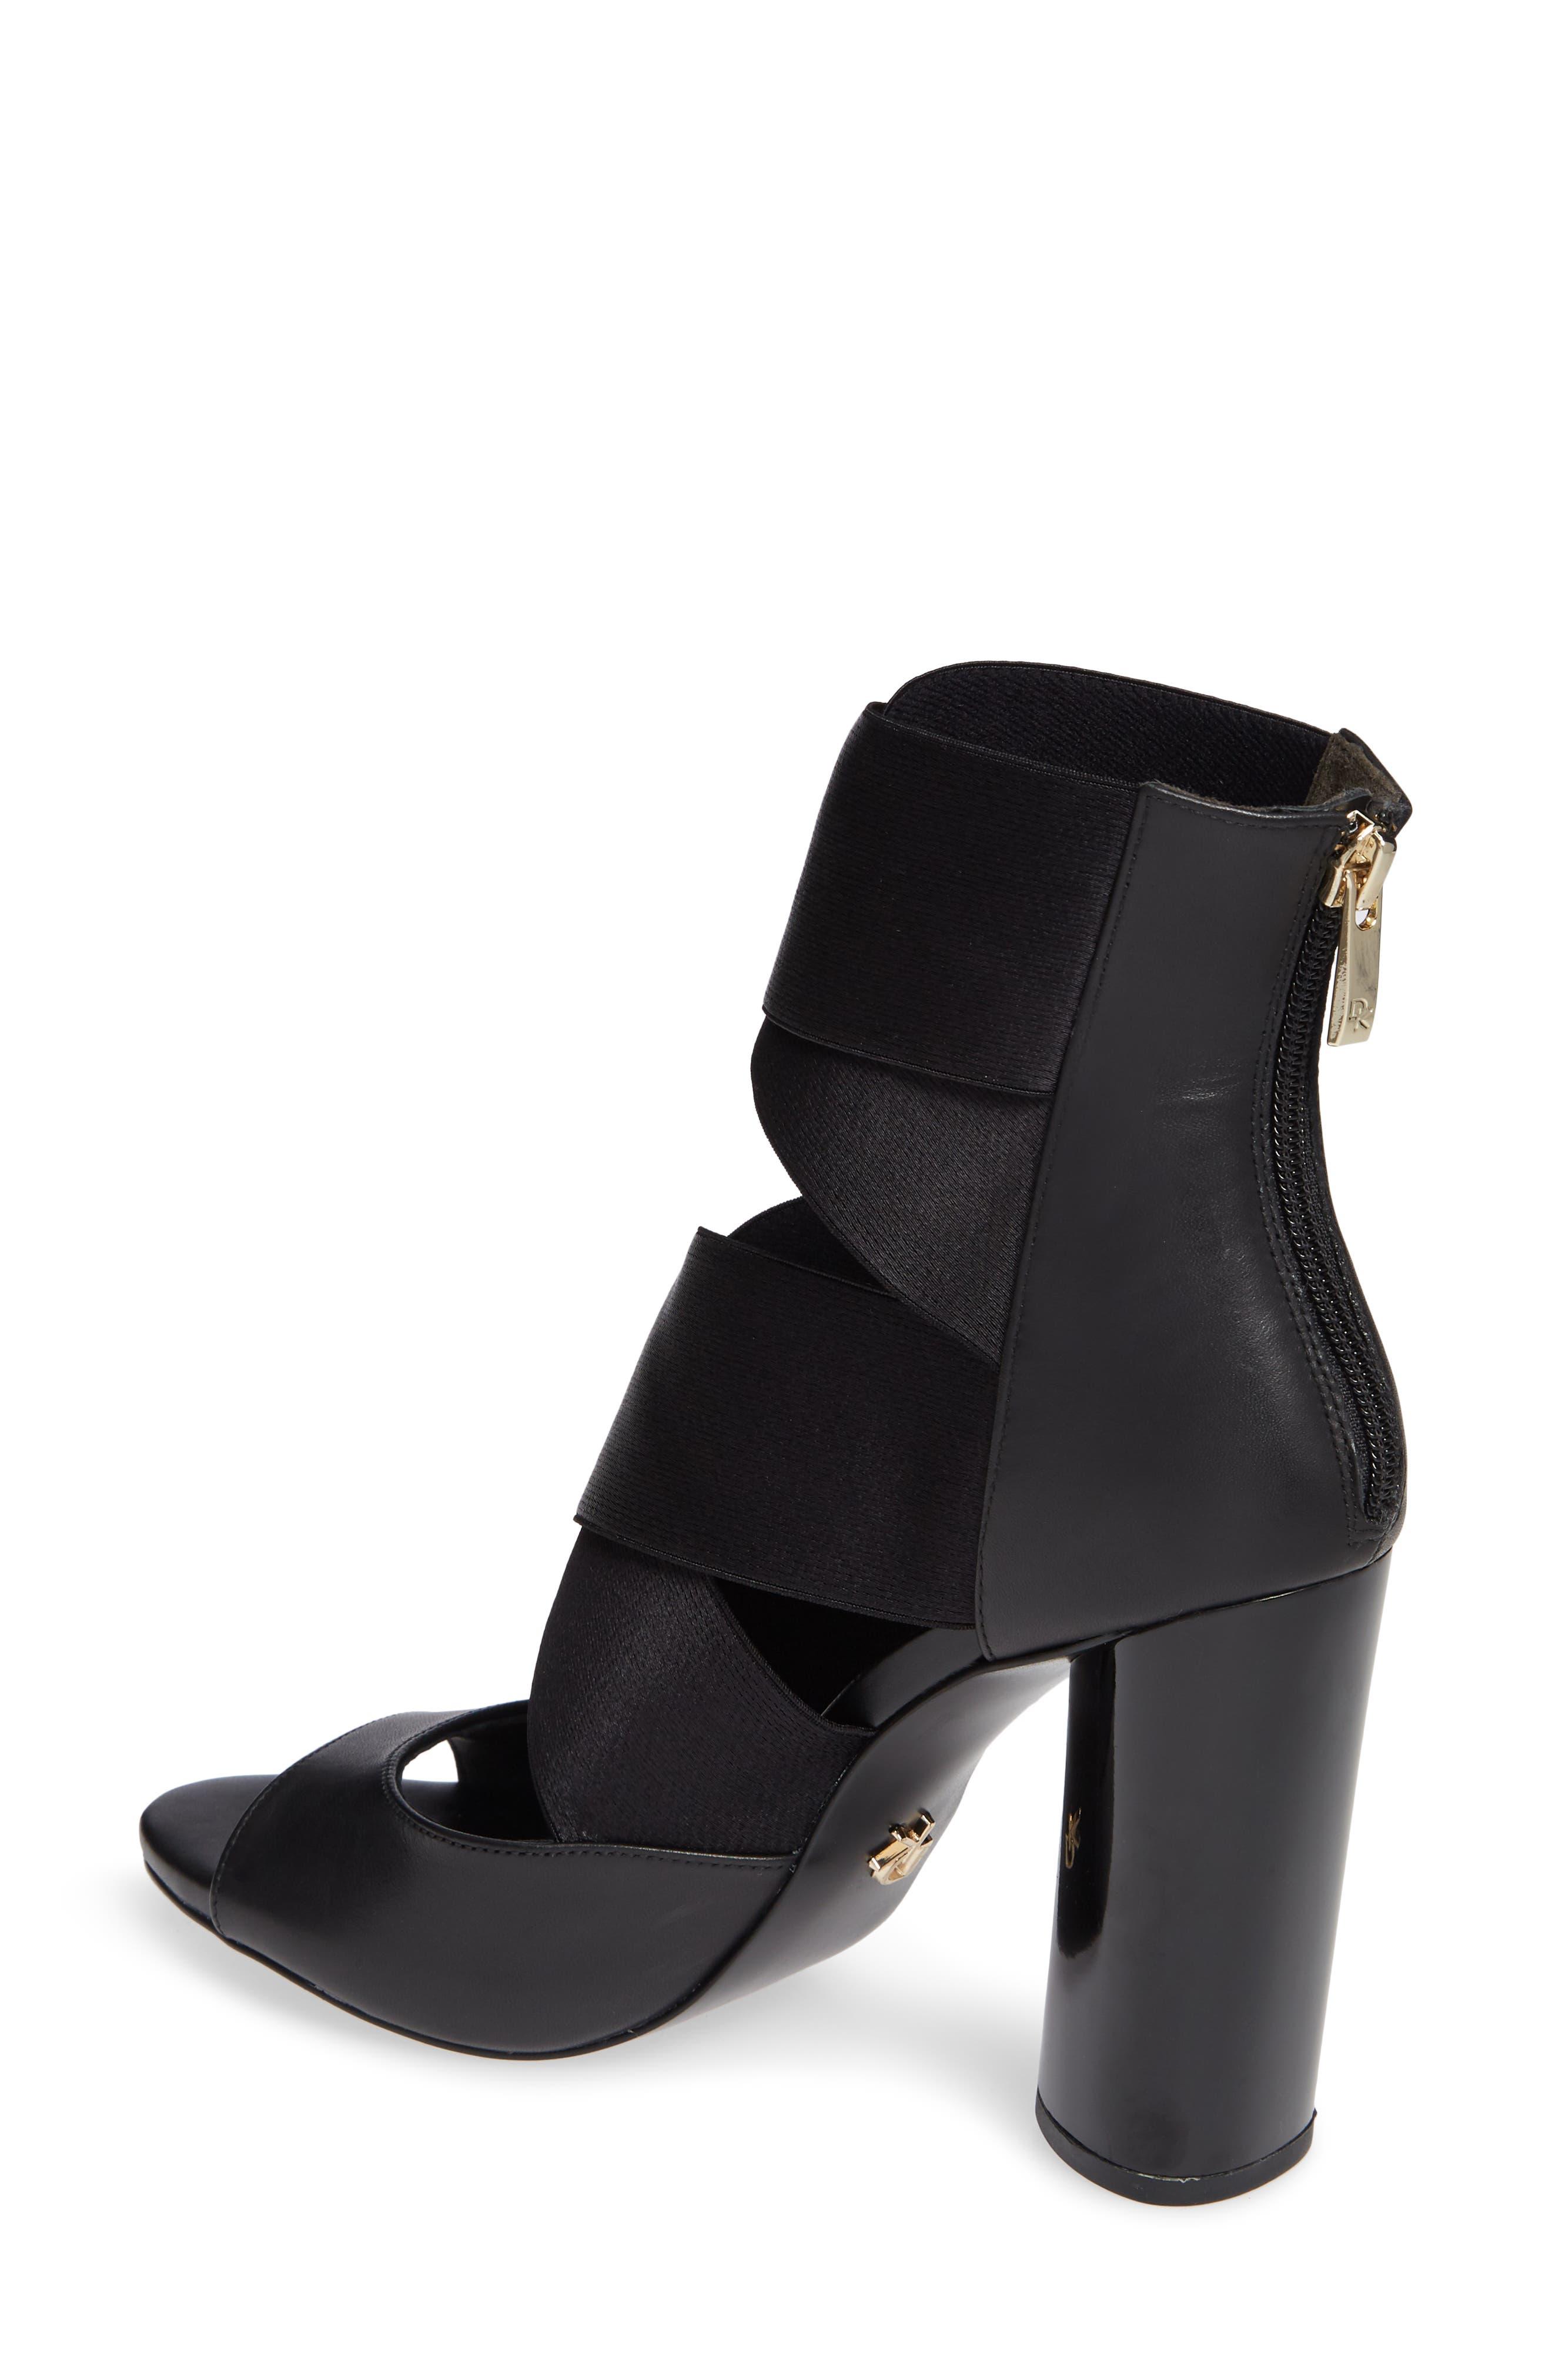 Donna Karan Briana Strappy High Sandal,                             Alternate thumbnail 2, color,                             BLACK CALF SHINY SATIN ELASTIC